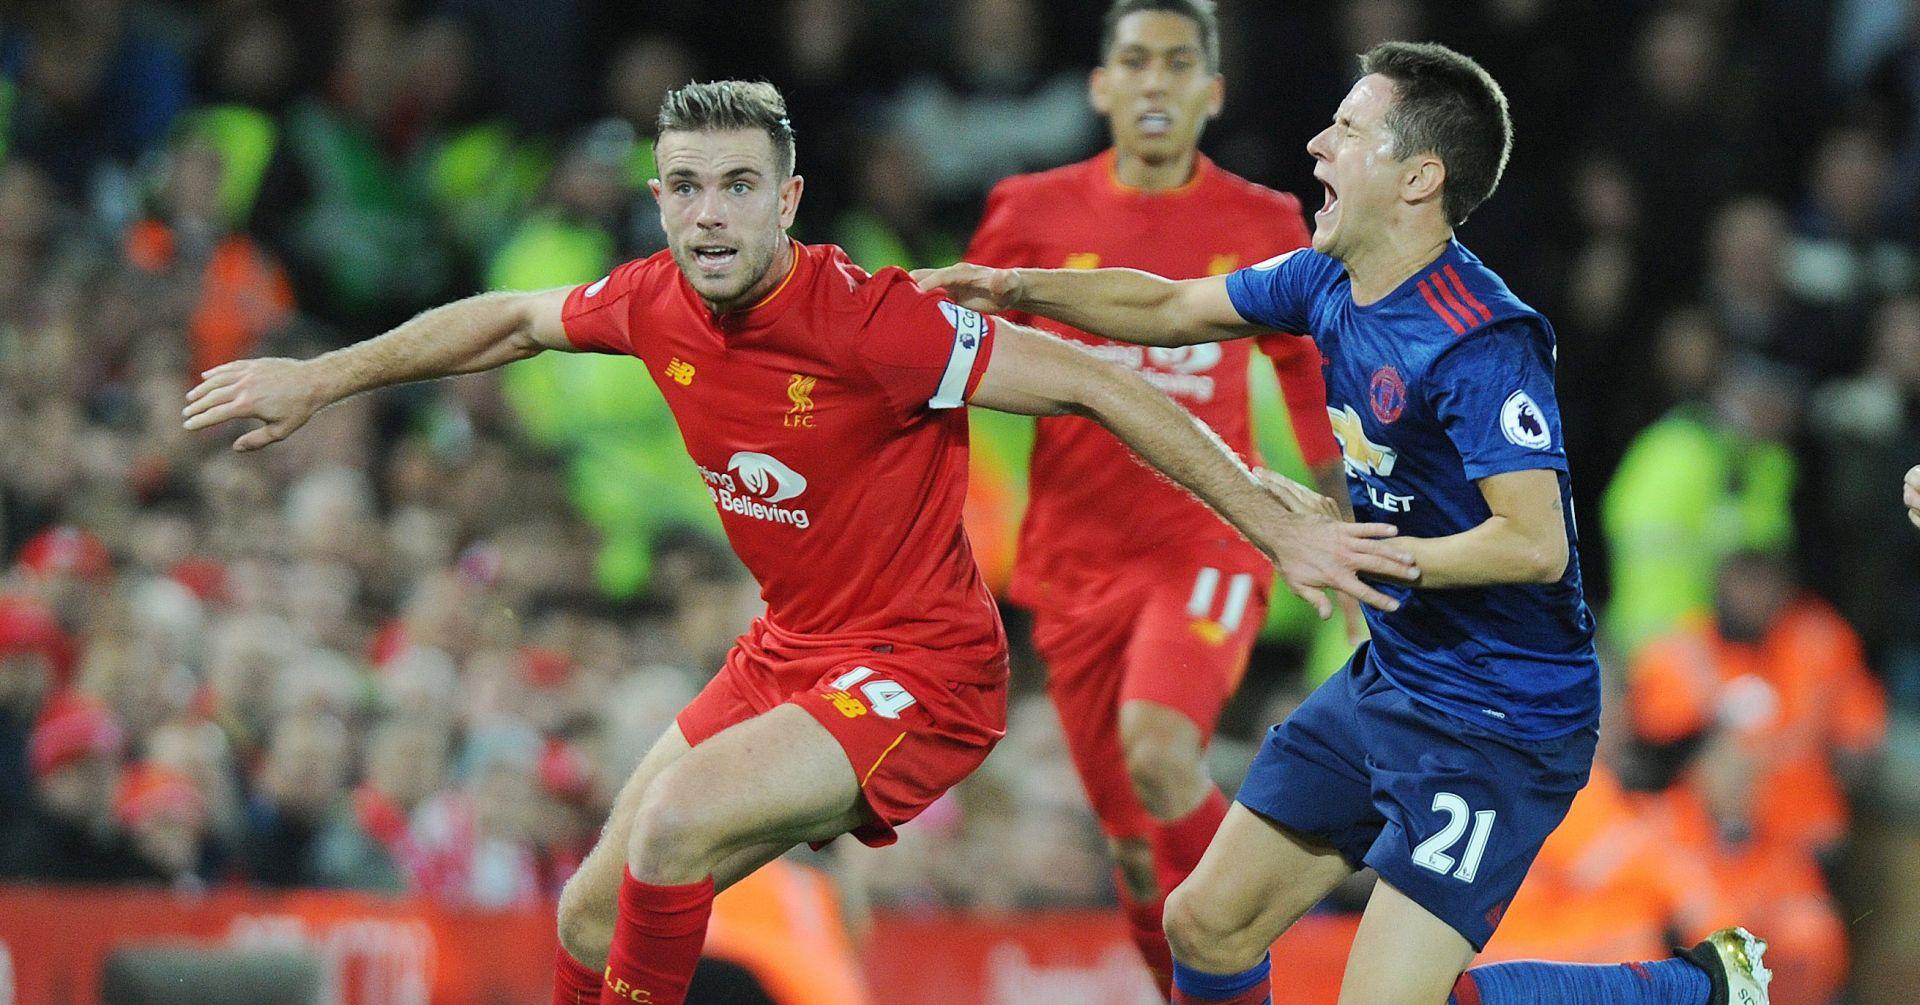 Jordan Henderson kapetan Engleske protiv Španjolske, Rooney ozlijeđen